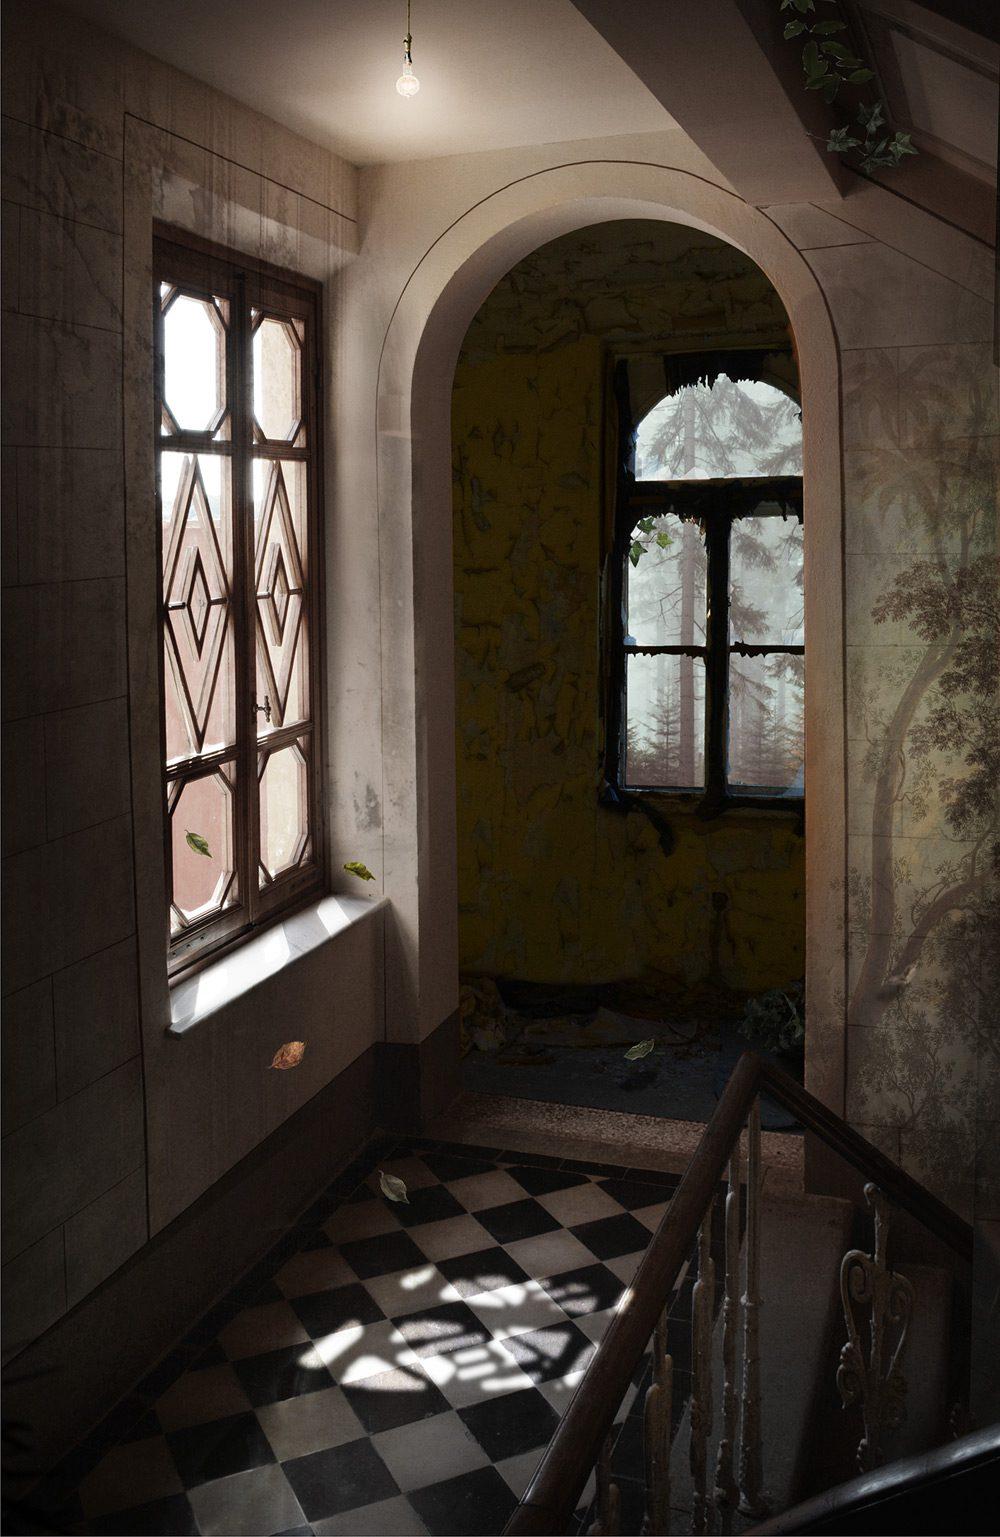 Balustrade, Suzanne Moxhay, James Freeman Gallery